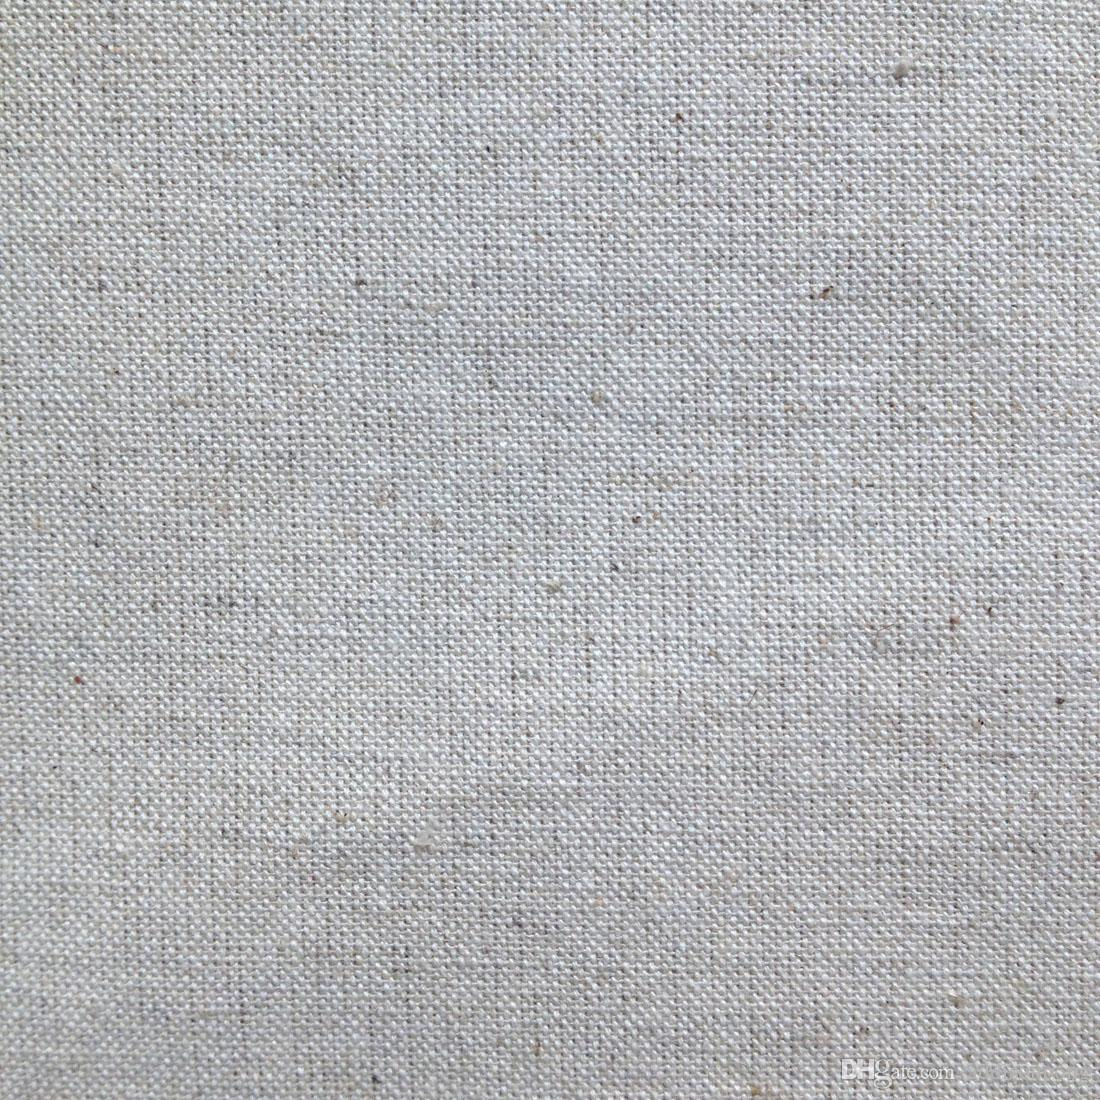 Plain Blank Natural Linen Cotton Blend Pillow Cover For Custom Print Linen  Pillow Case Blank DIY Print Pillow Case Sunbrella Cushion Wicker Patio